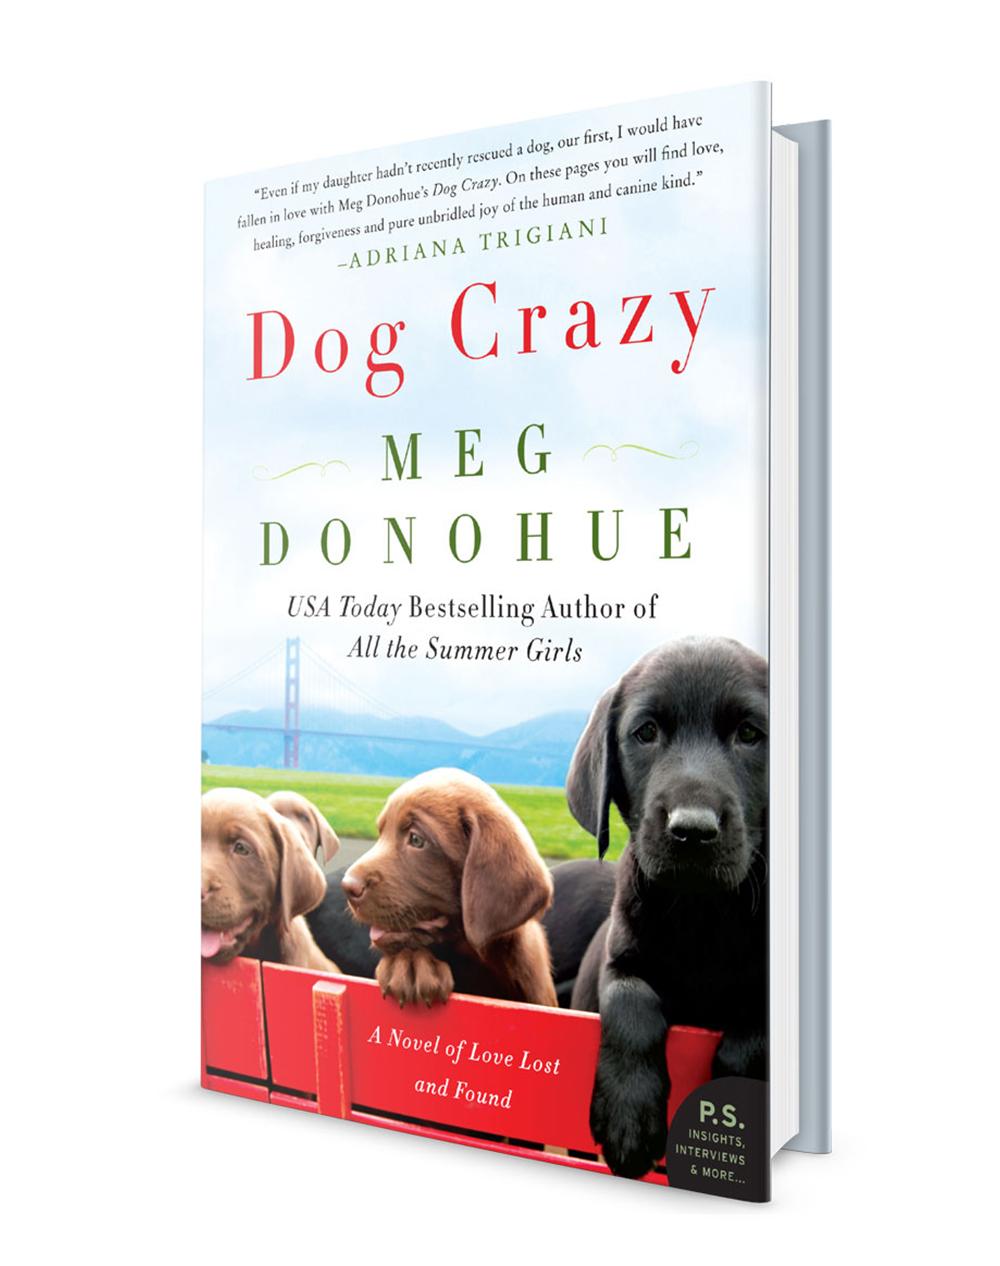 Dog-crazy_book-jacket.jpg